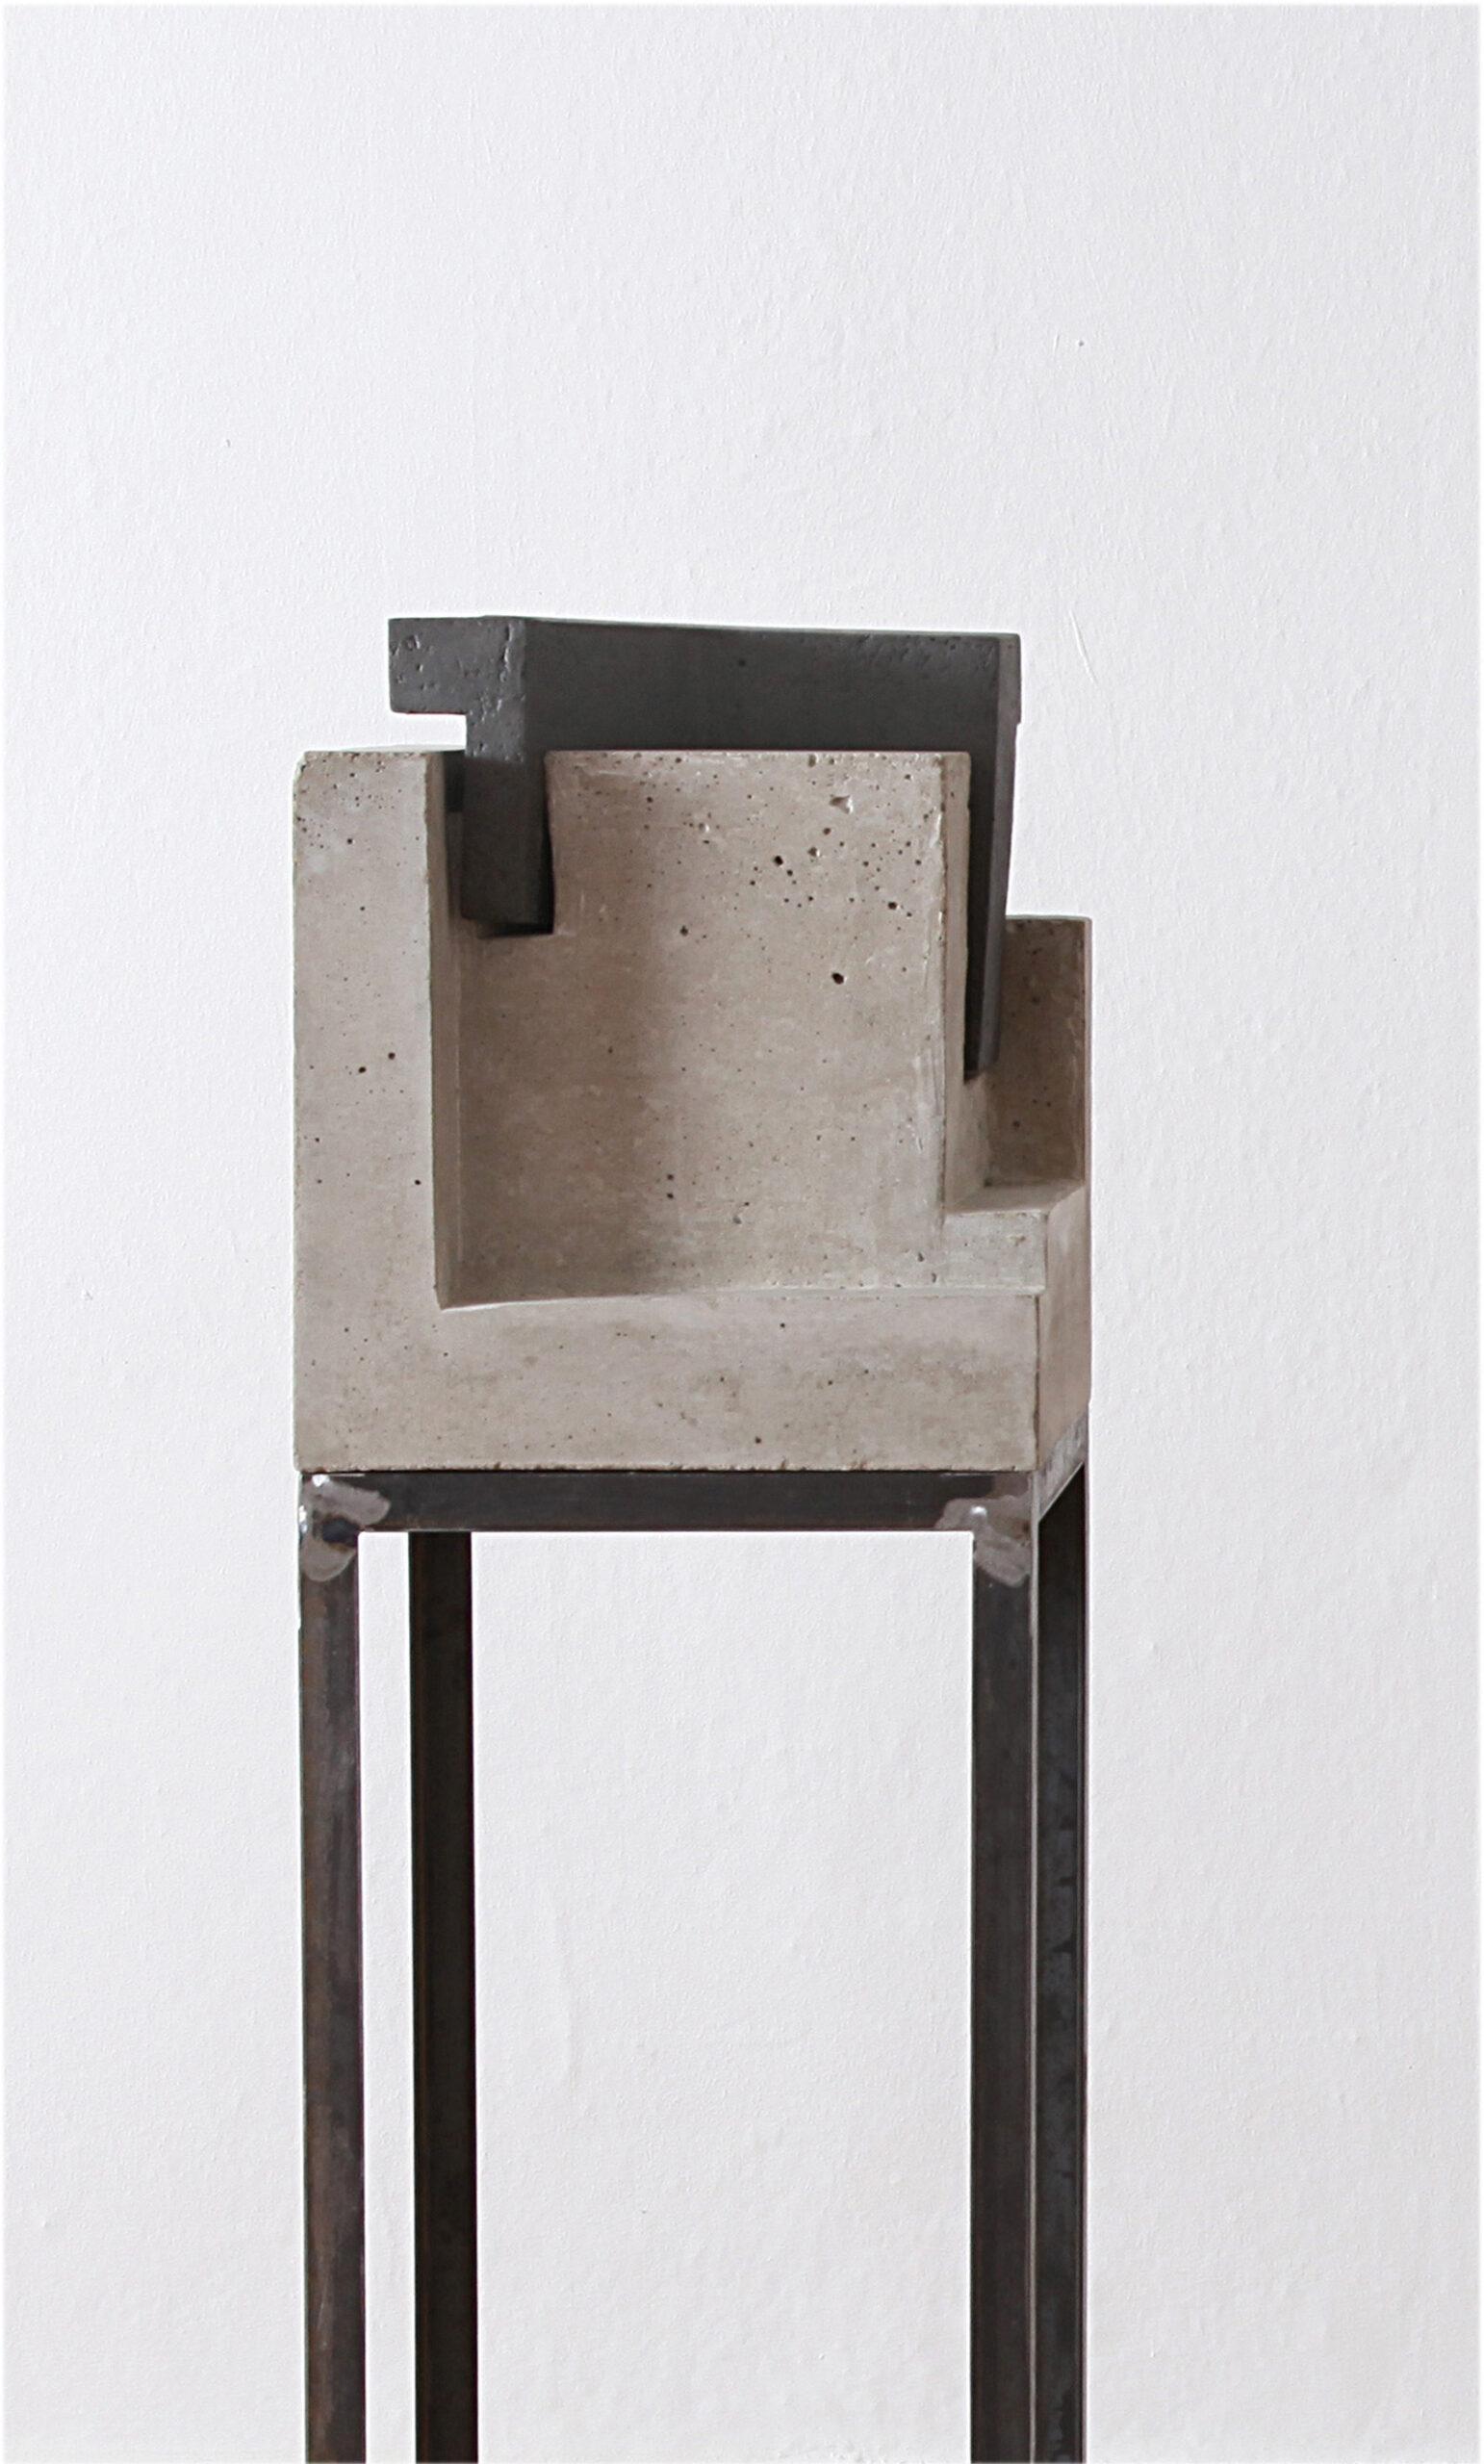 Kubus Ensemble | 2009 | Beton, Keramik | 30 x 30 x 115 cm